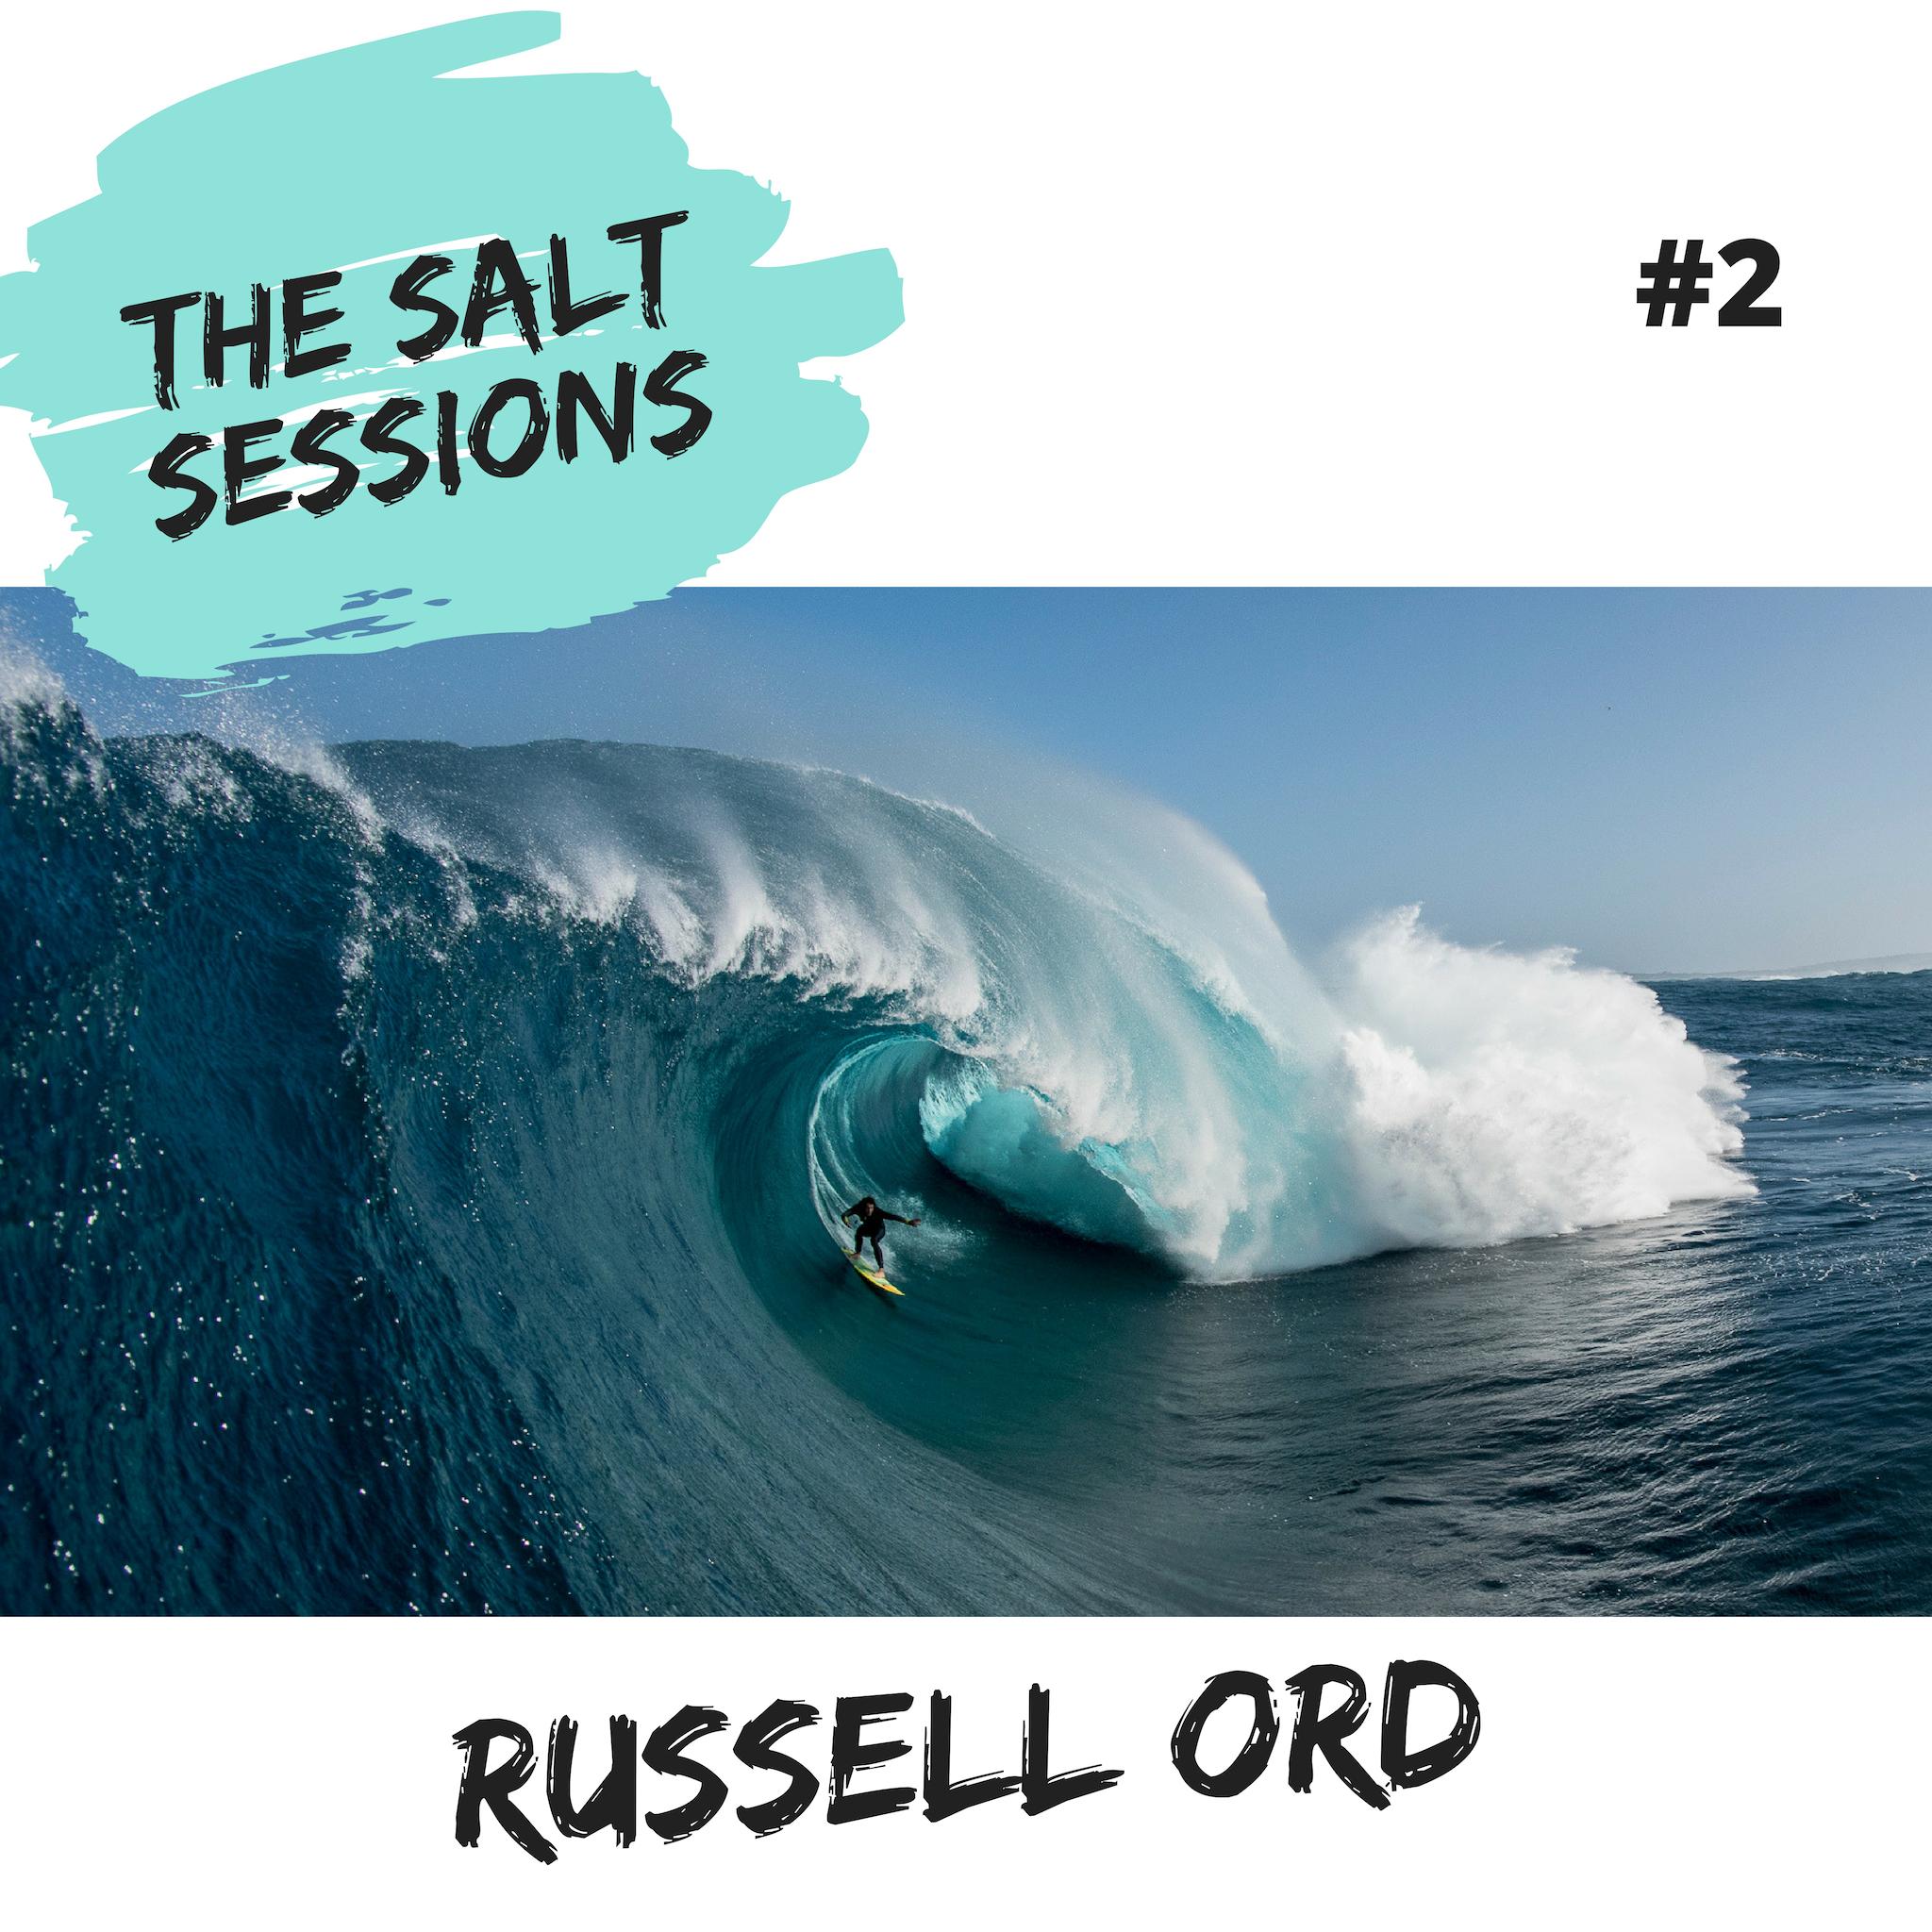 RUSSELL_ORD.jpg